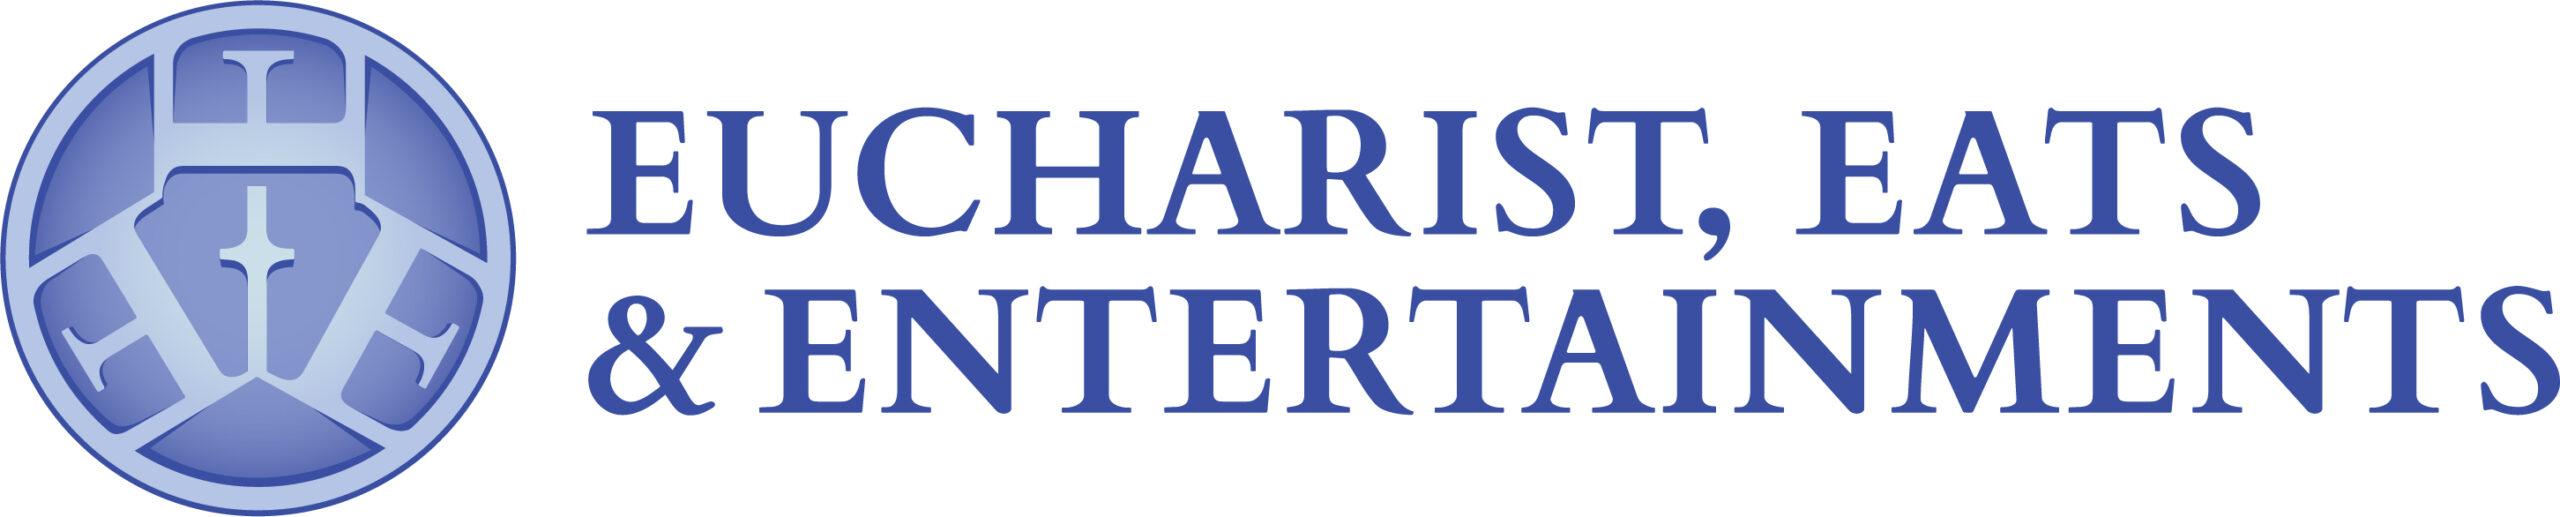 Eucharist, Eat and Entertainment Logo